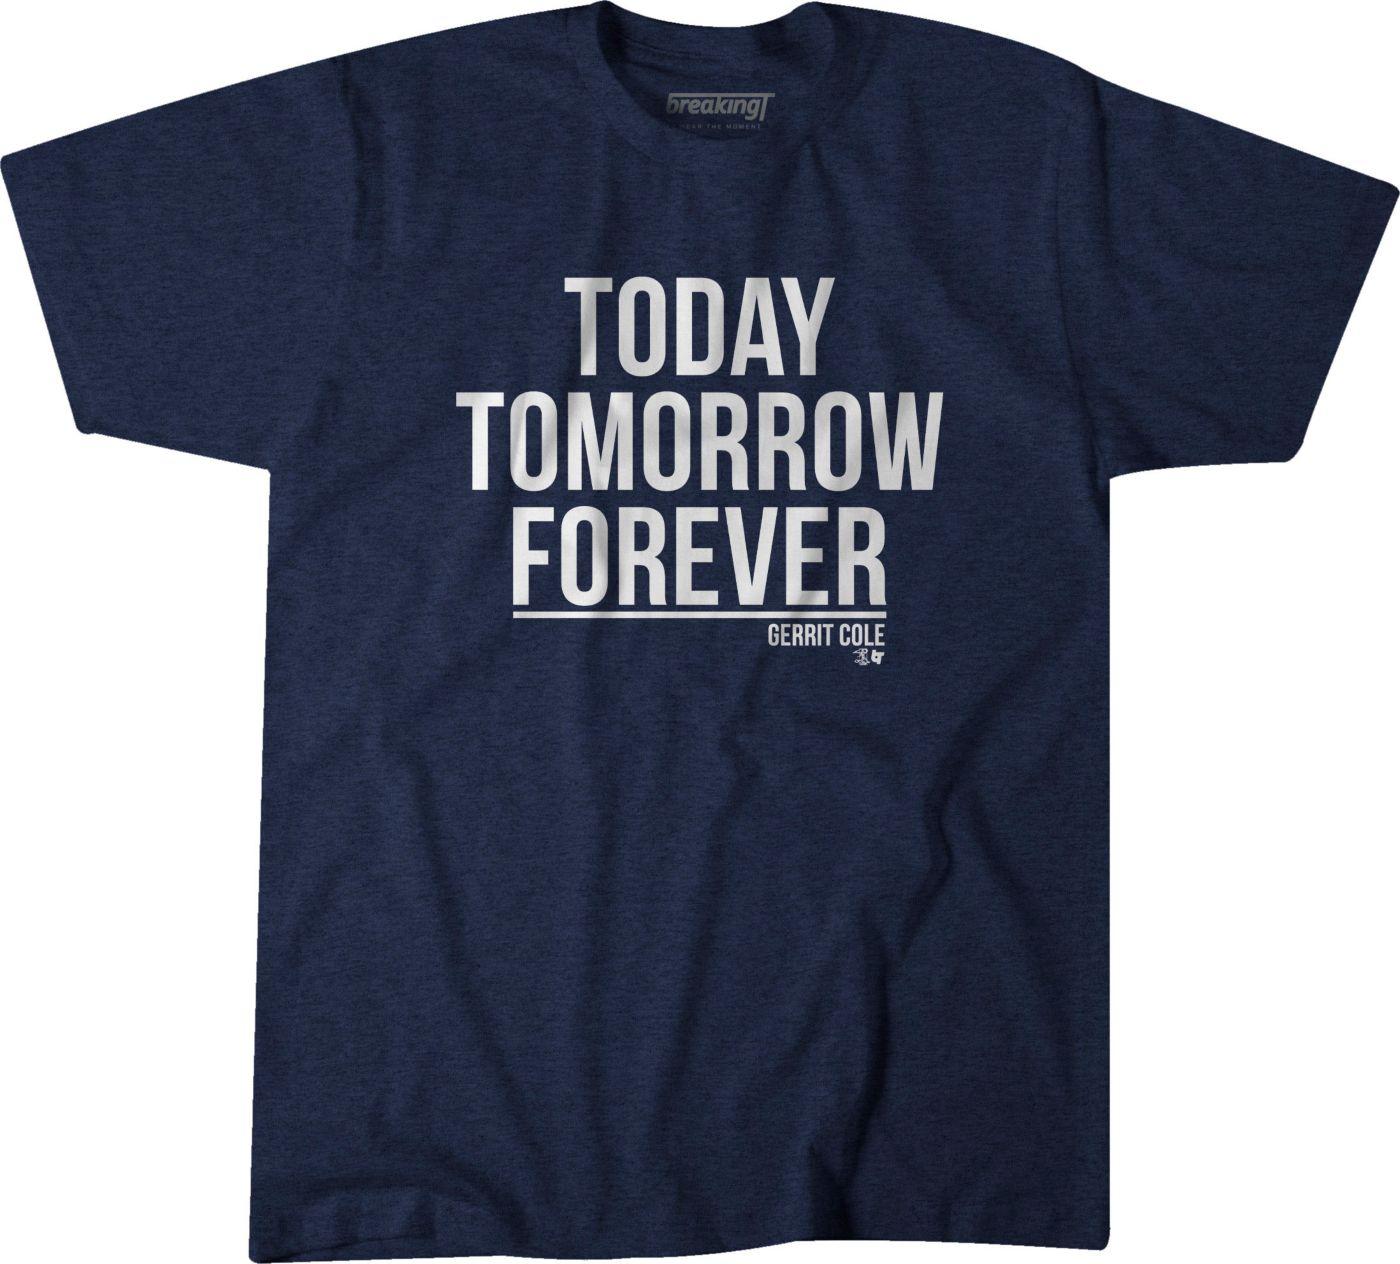 BreakingT Men's New York Yankees Gerrit Cole 'Today, Tomorrow, Forever' Navy T-Shirt